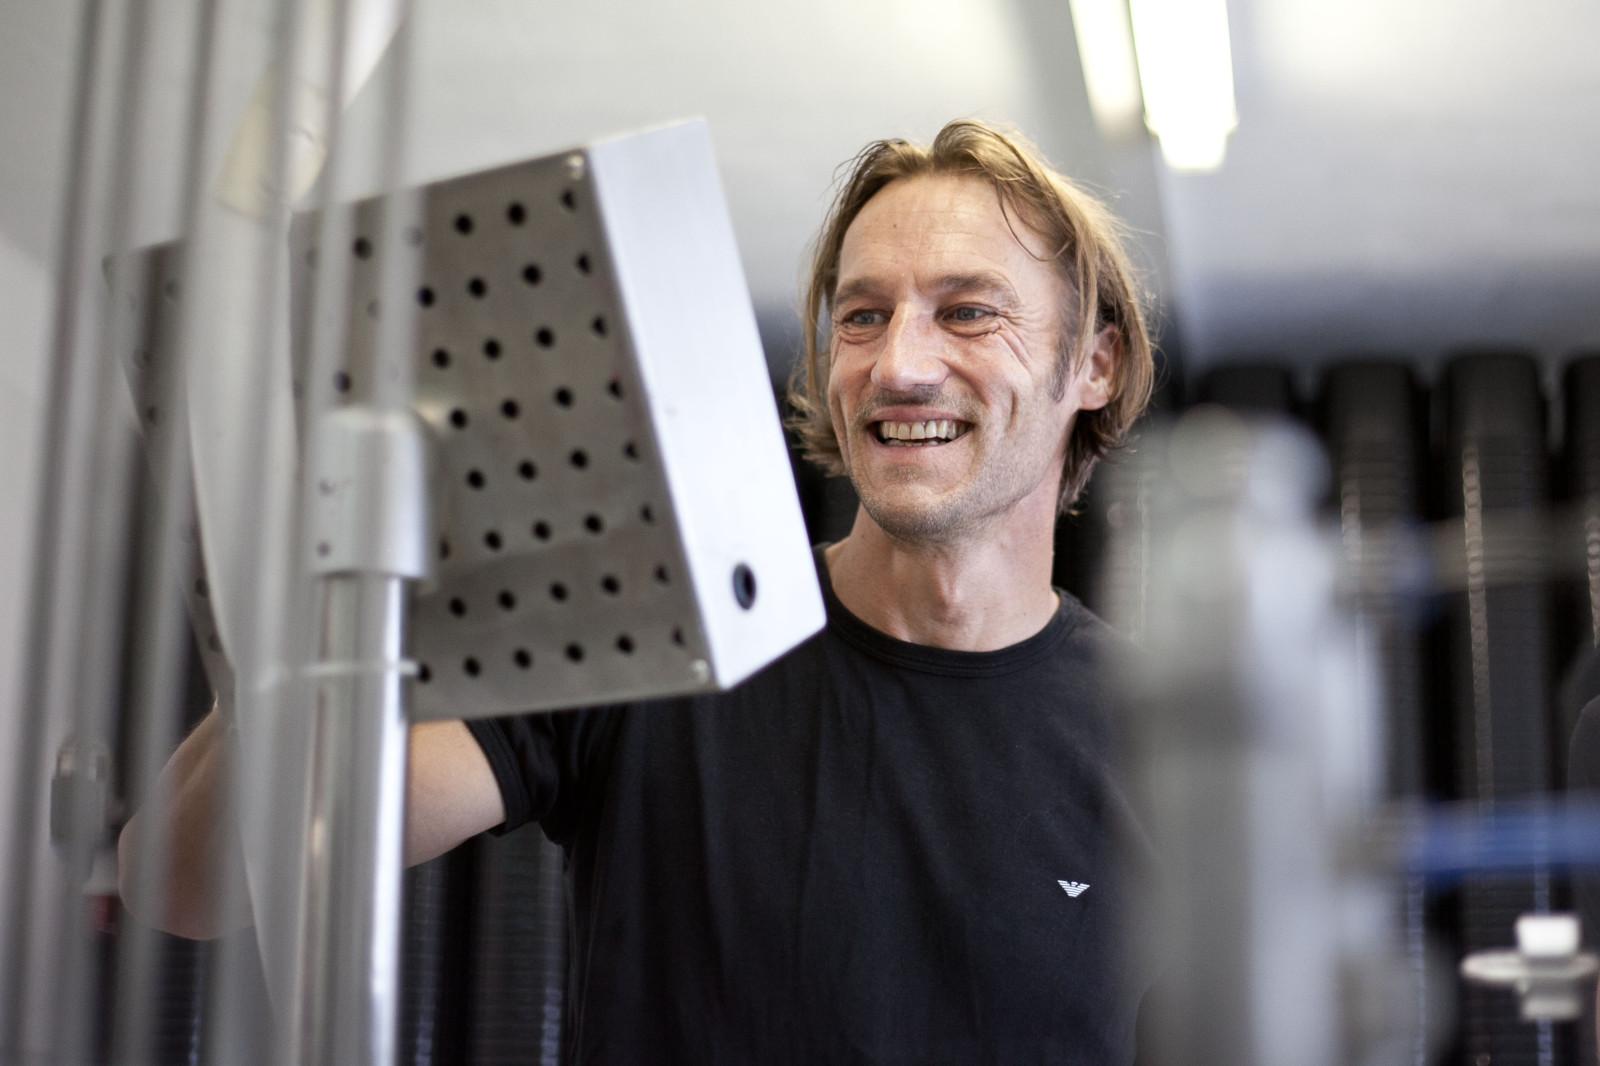 Thomas Höfinger